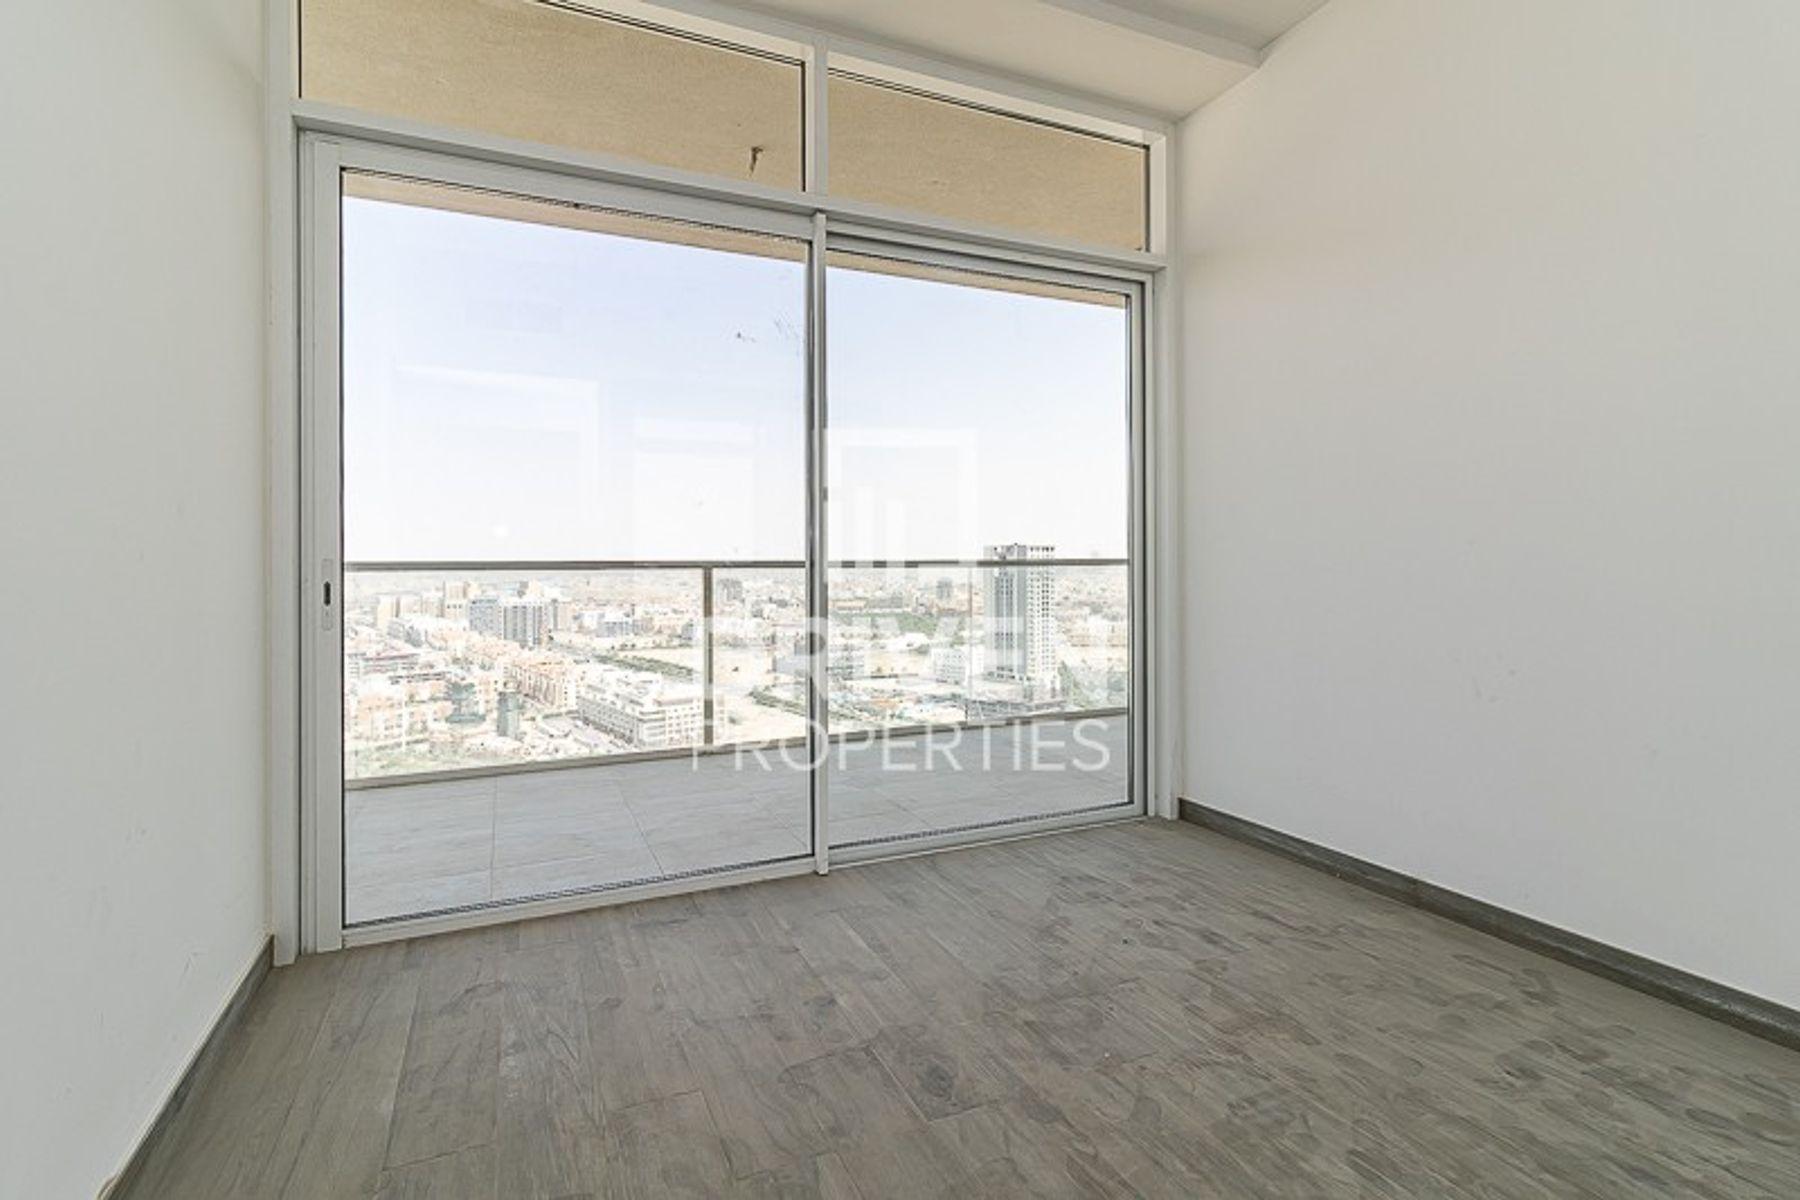 Apartment for Rent in Zaya Hameni - Jumeirah Village Circle